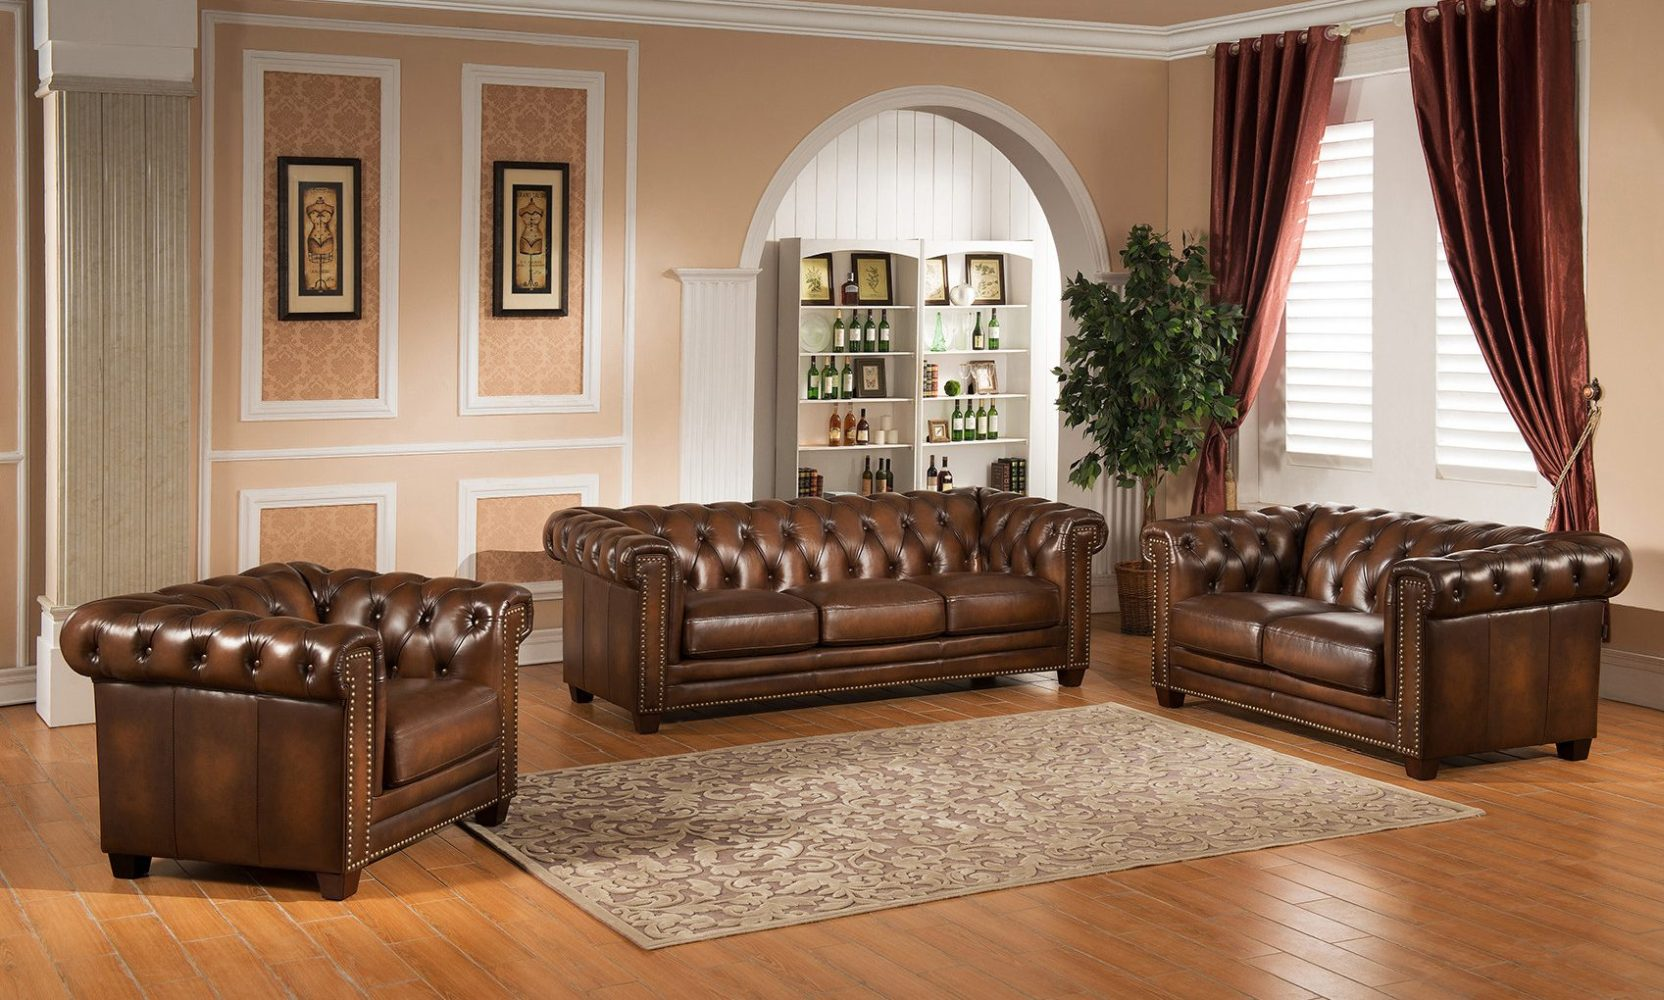 Living Room Sofa Sets - Surrey Furniture Warehouse